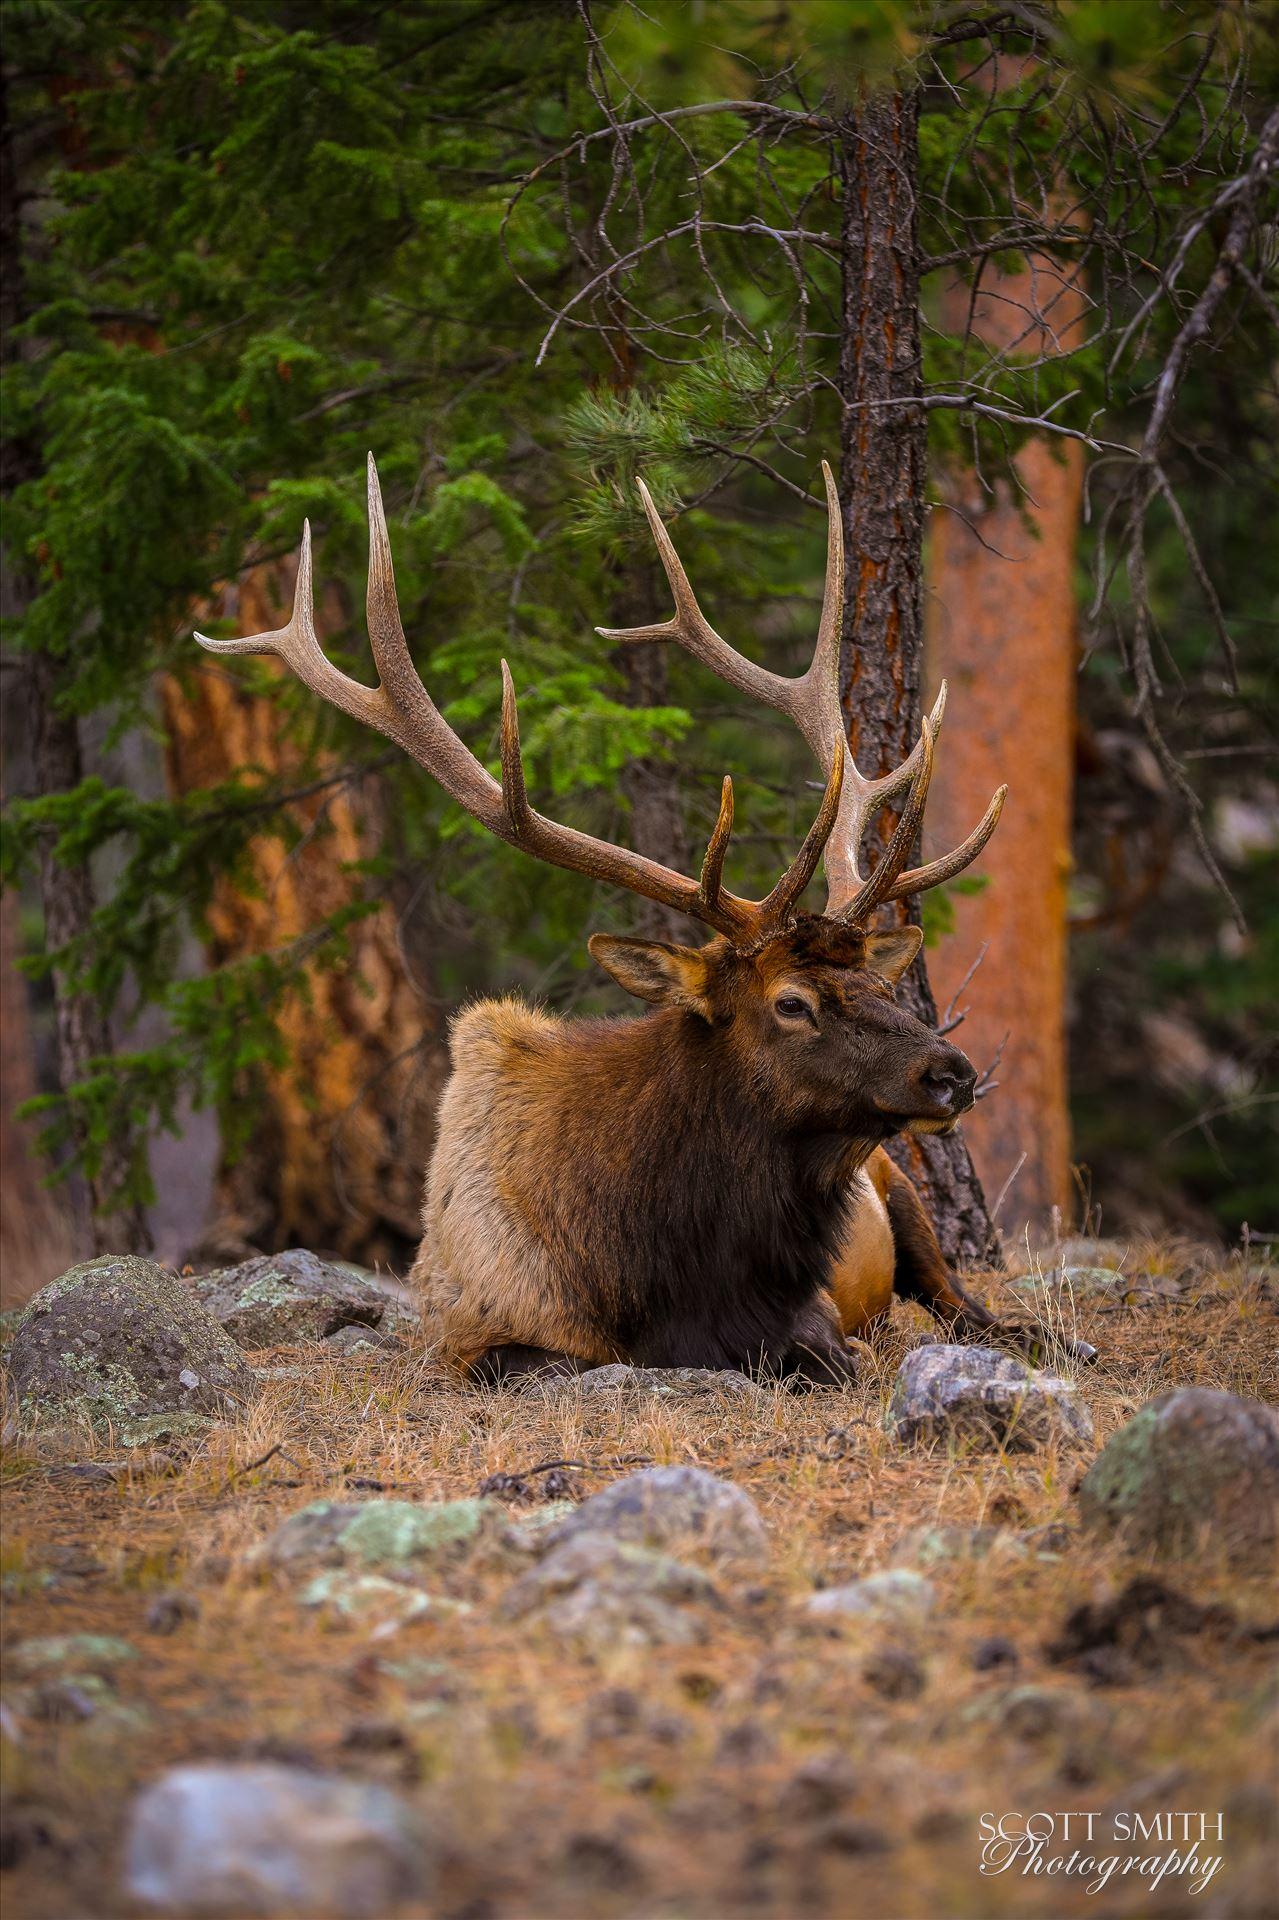 Sunday Elk No 06 - A heard of Elk near the entrance to Rocky Mountain National Park, Estes Park, Colorado. by D Scott Smith